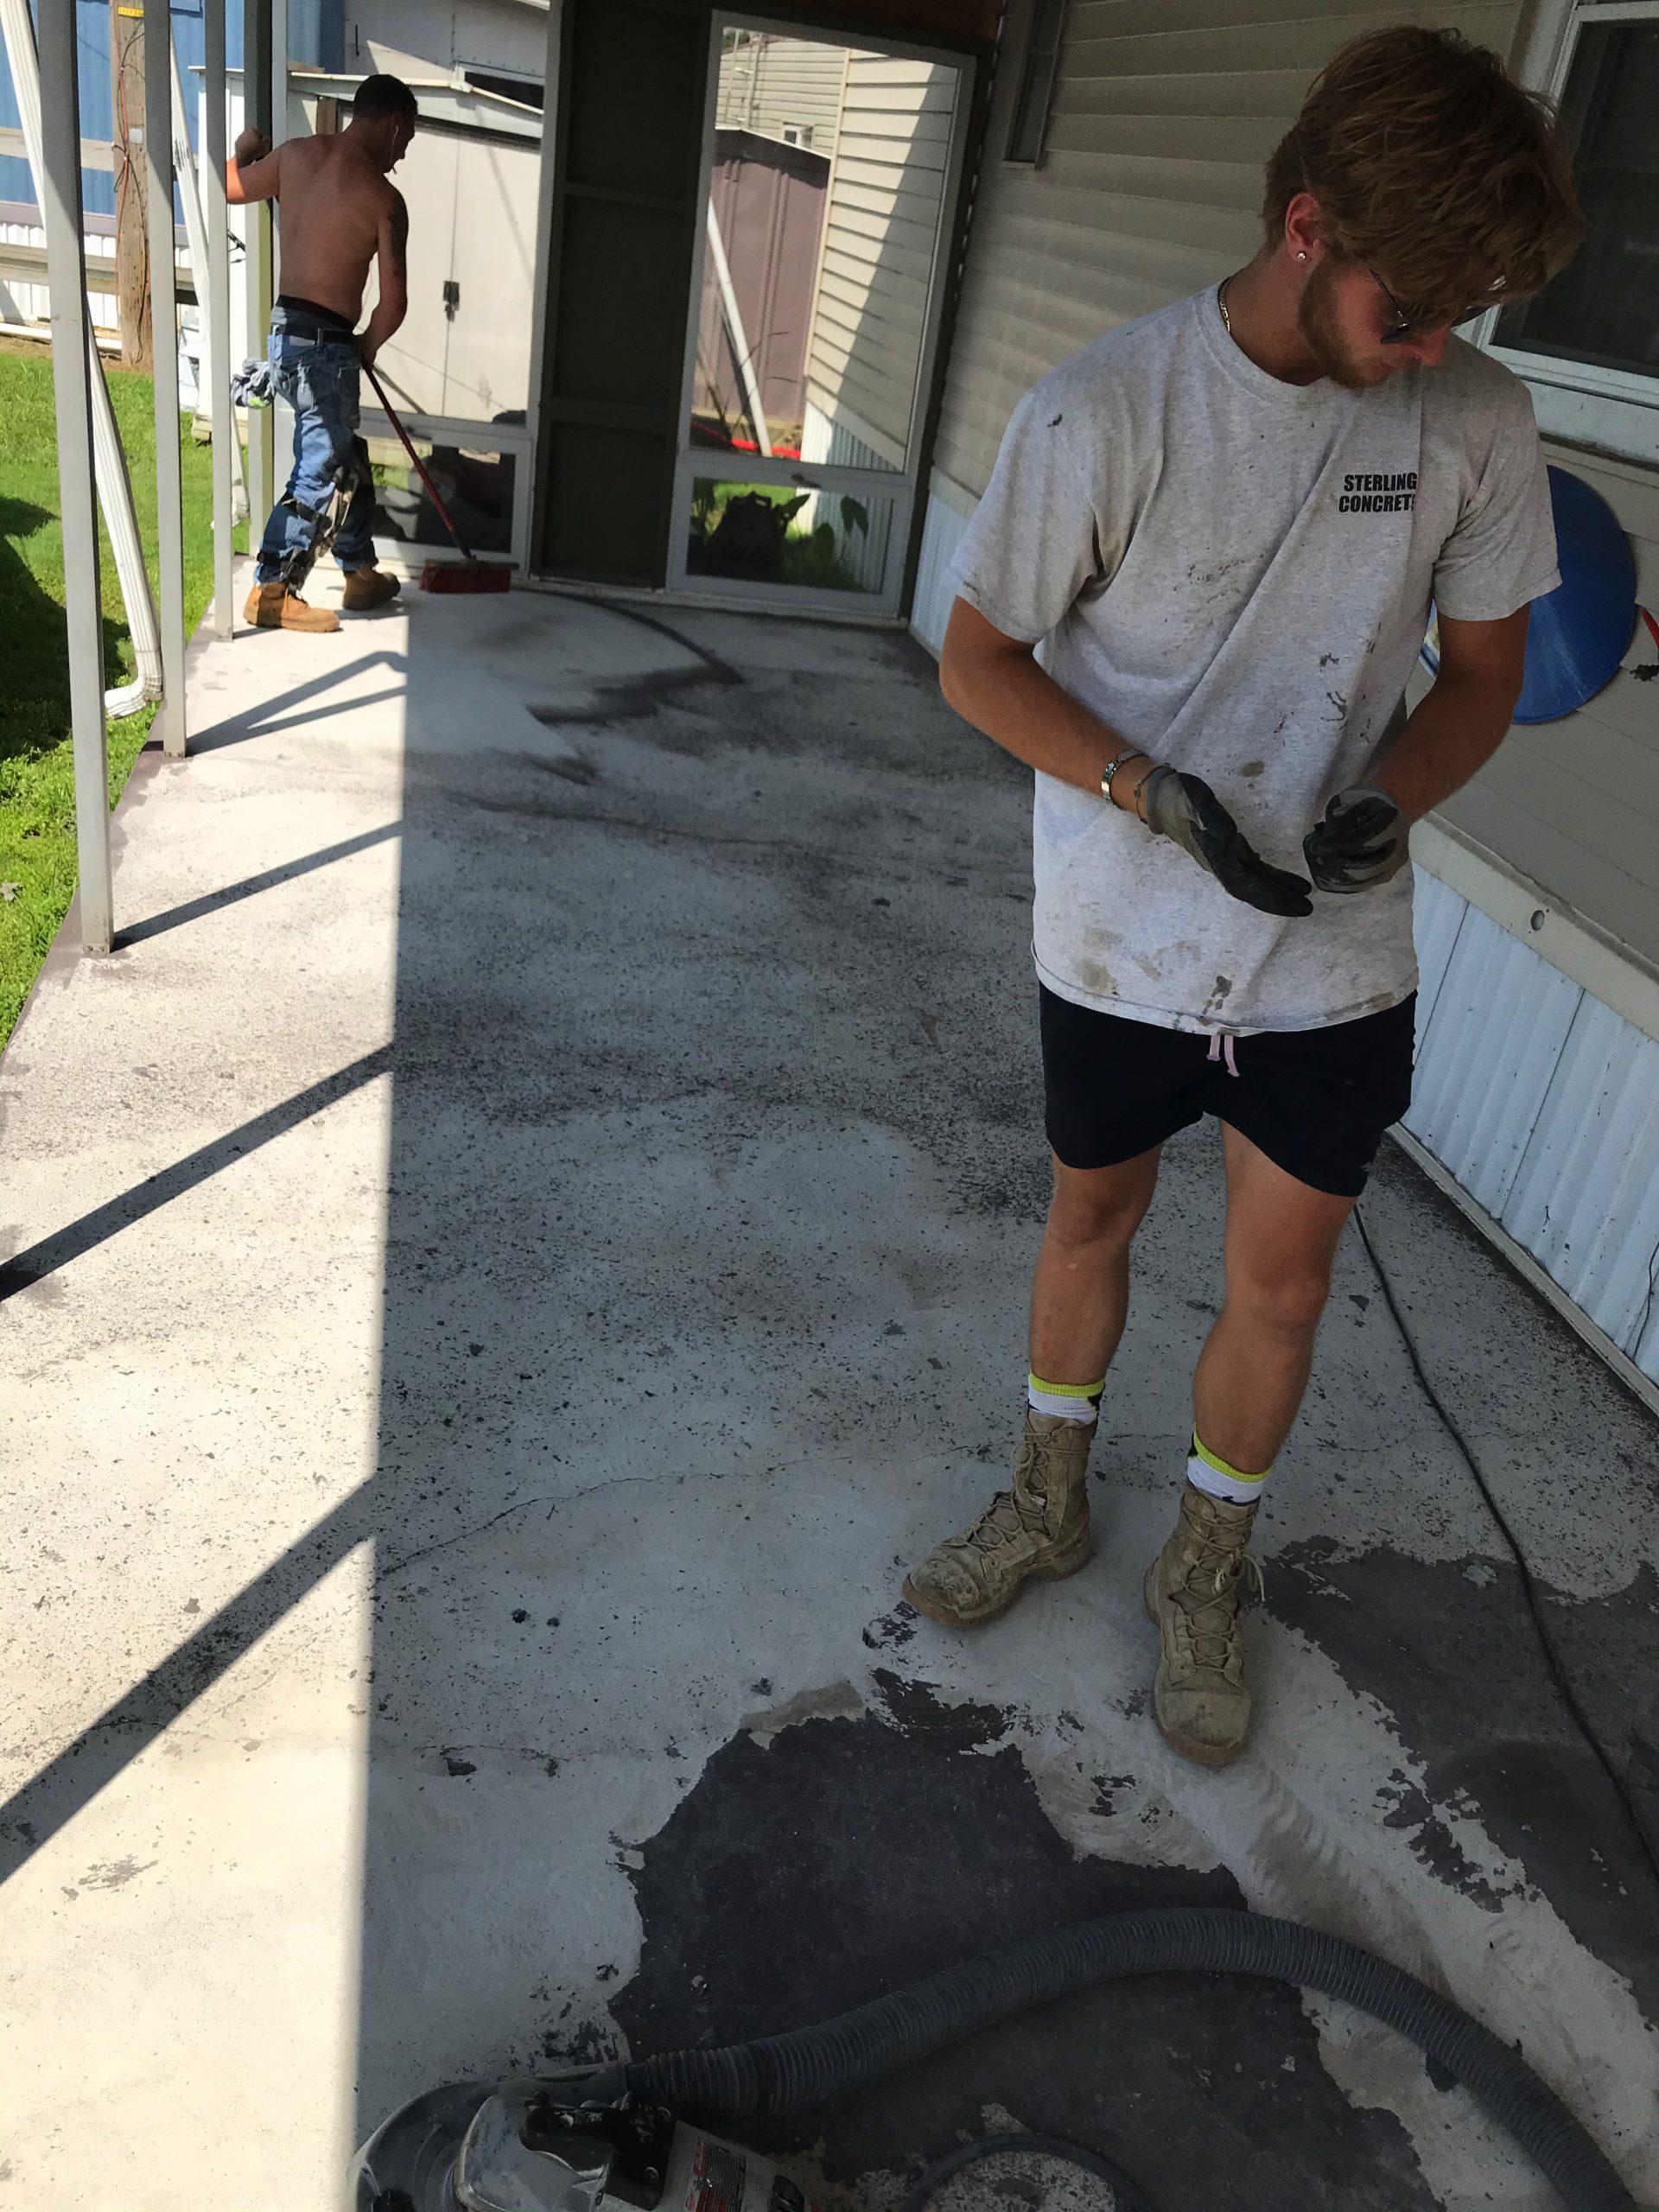 Stained Concrete Floor, Concrete Floor Finishes, Floor-Tex Topcoat |